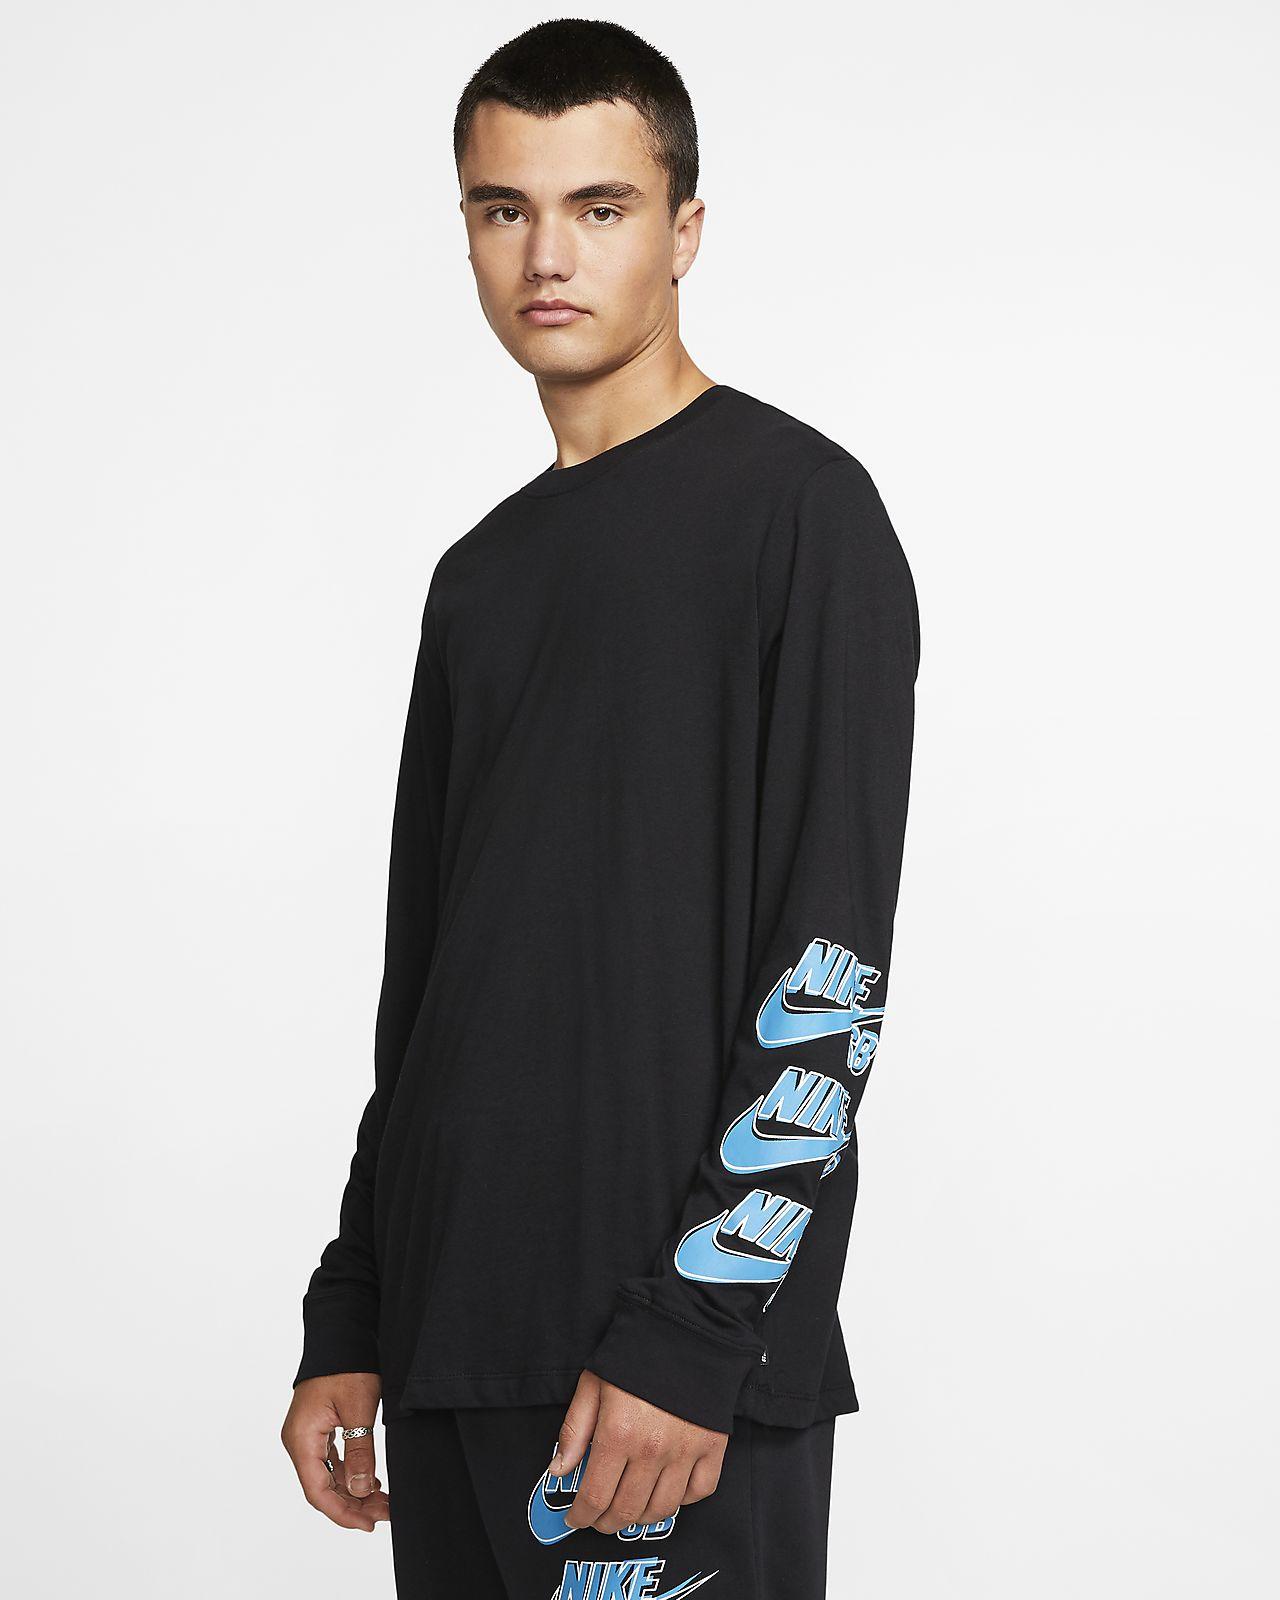 Nike SB Langarm Skate T Shirt für Herren